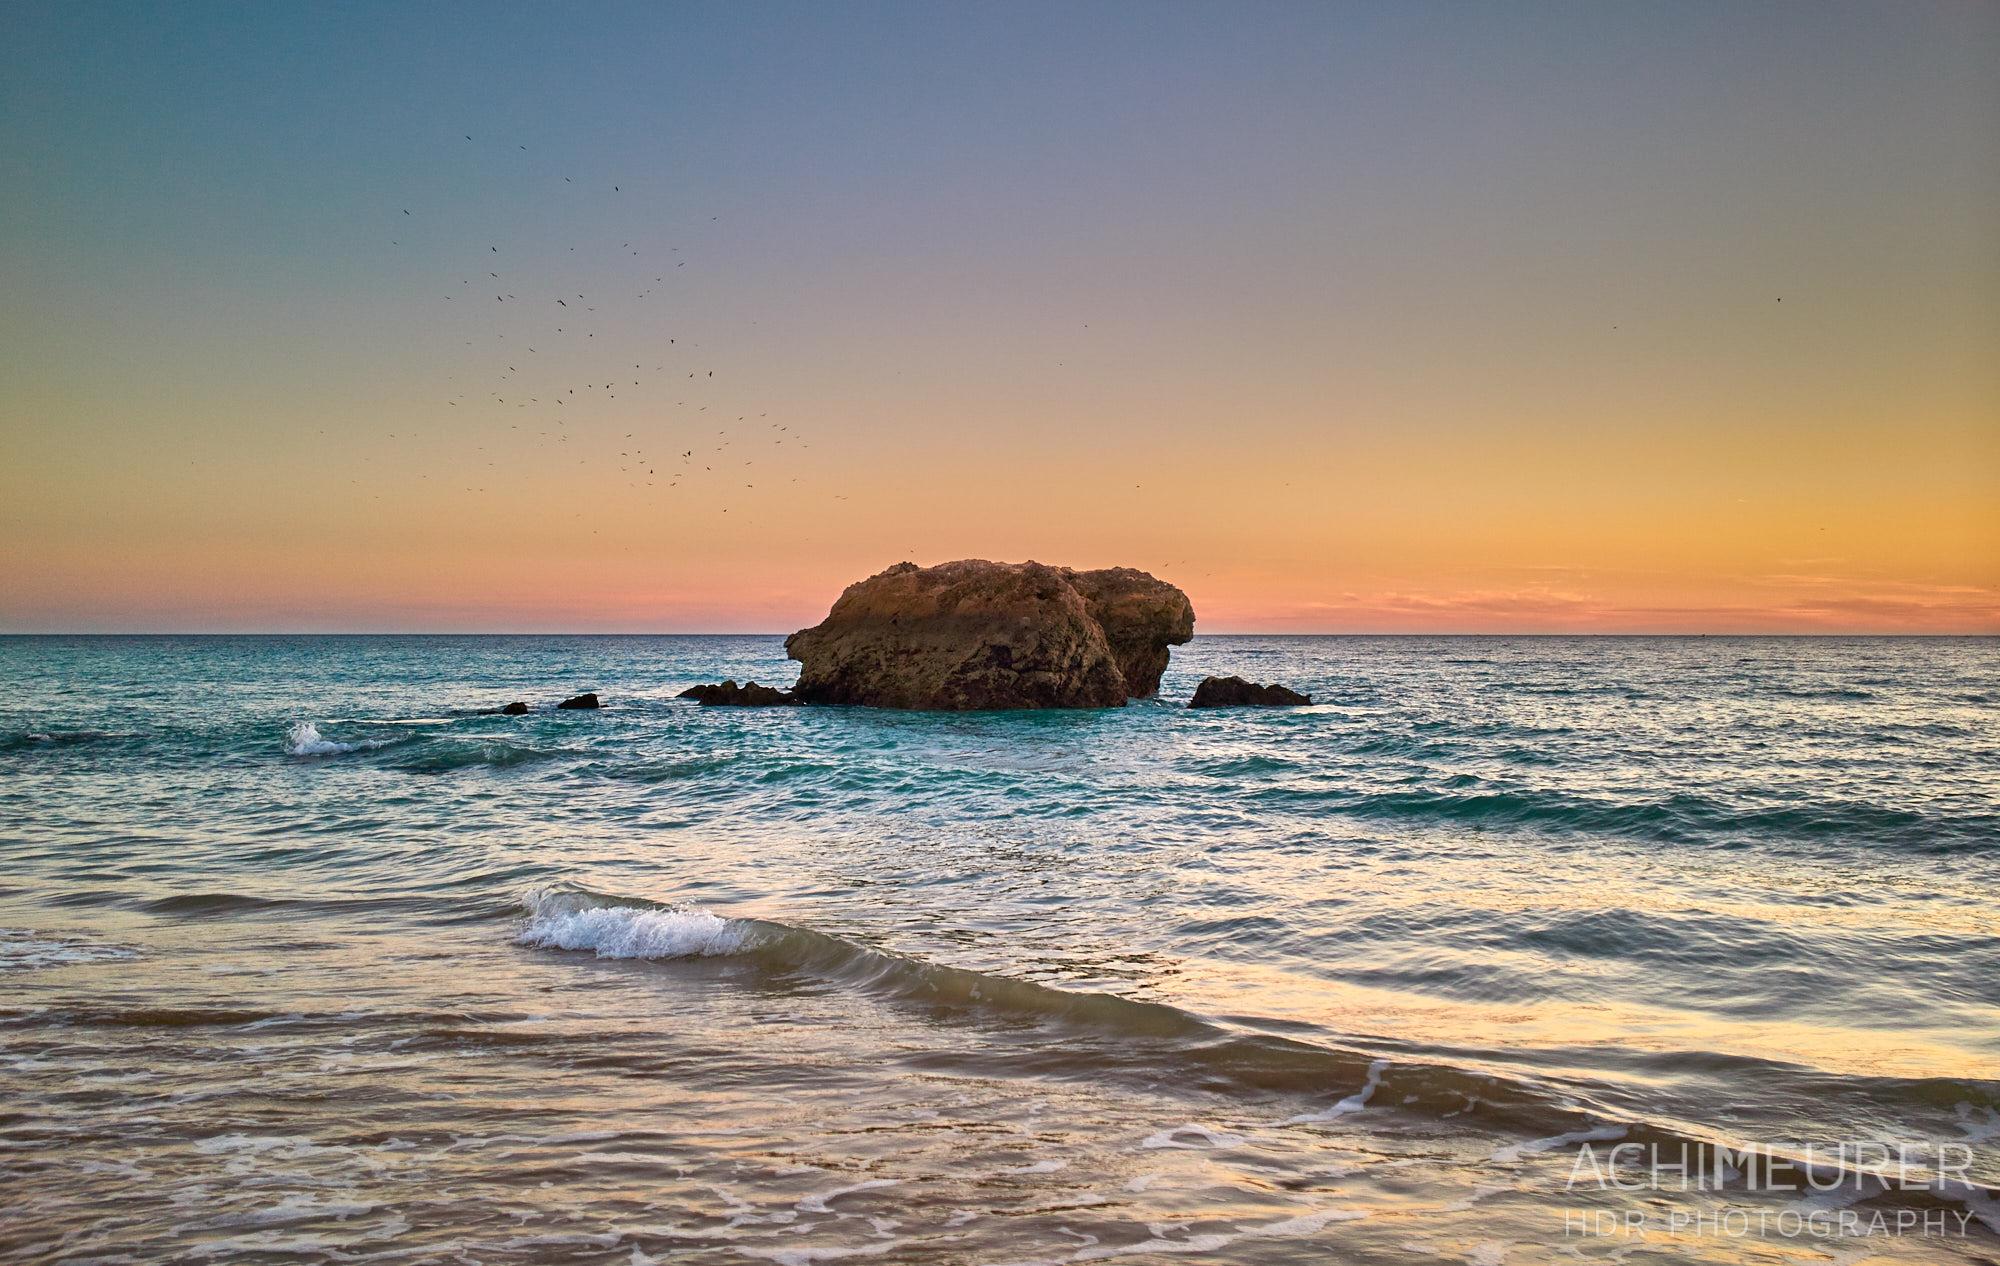 Sonnenuntergang am Strand von Albufeira, Algarve, Portugal by Achim Meurer.